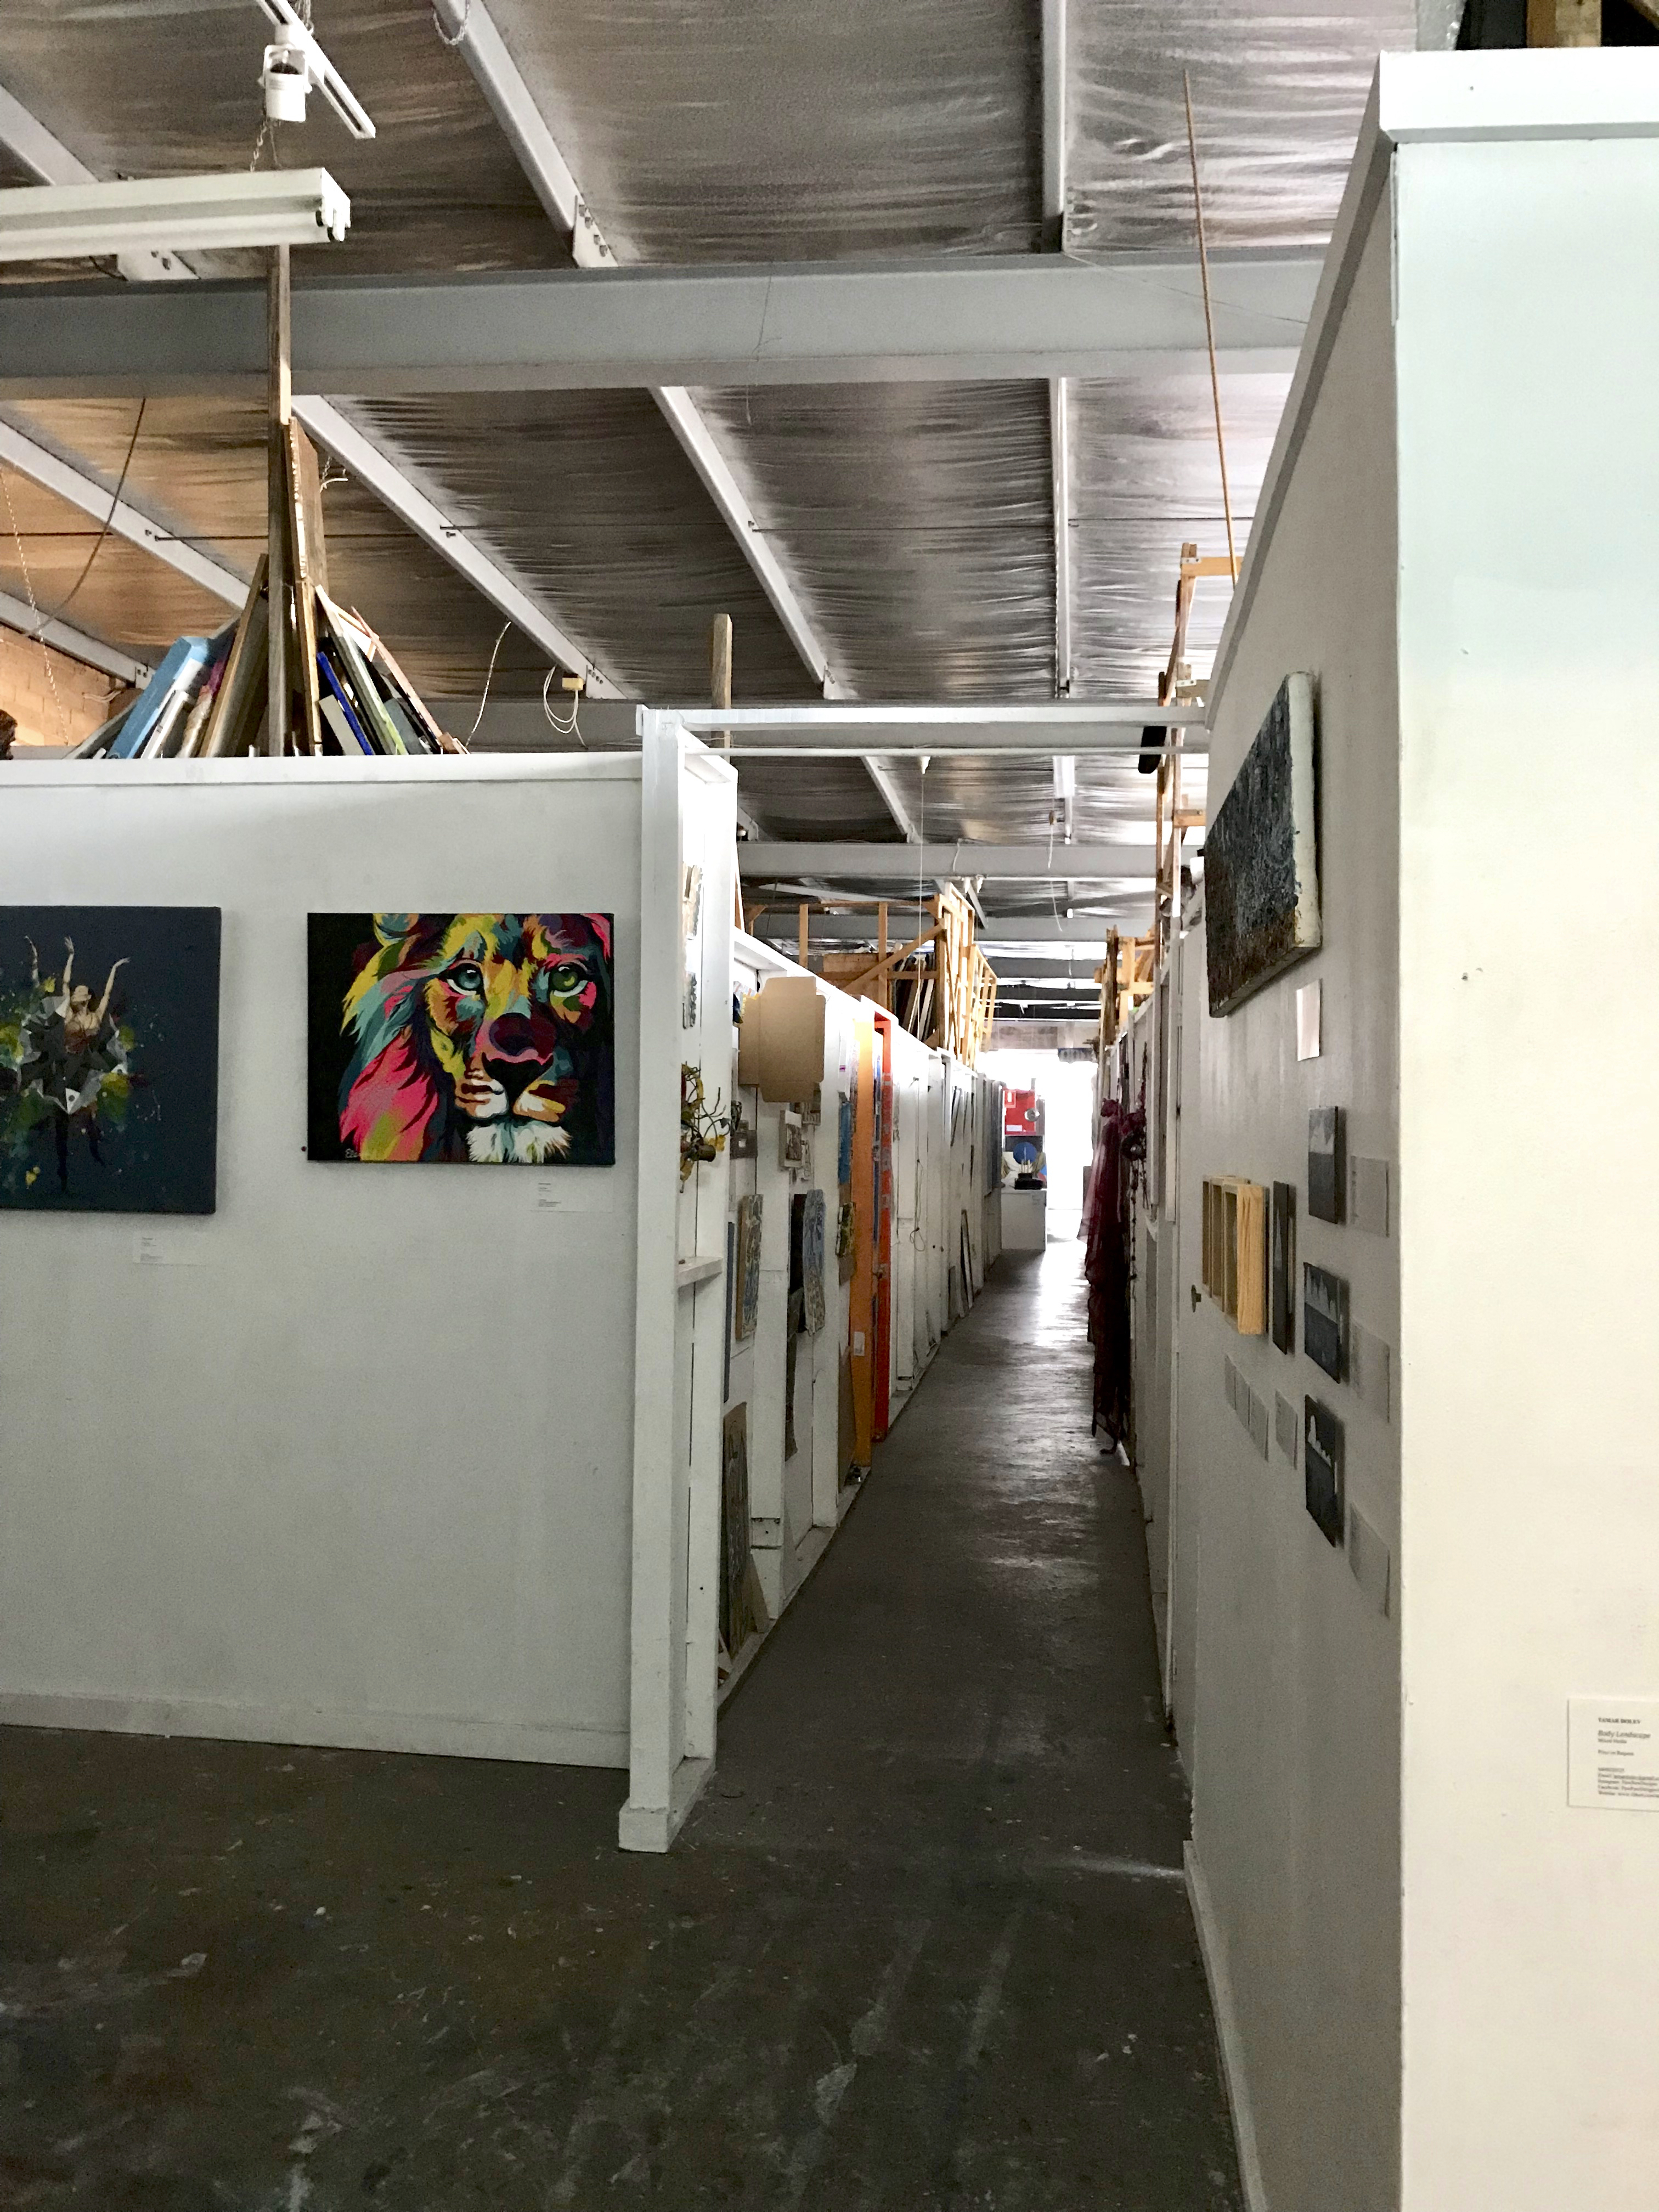 Artist's Studio 106 (St Kilda)